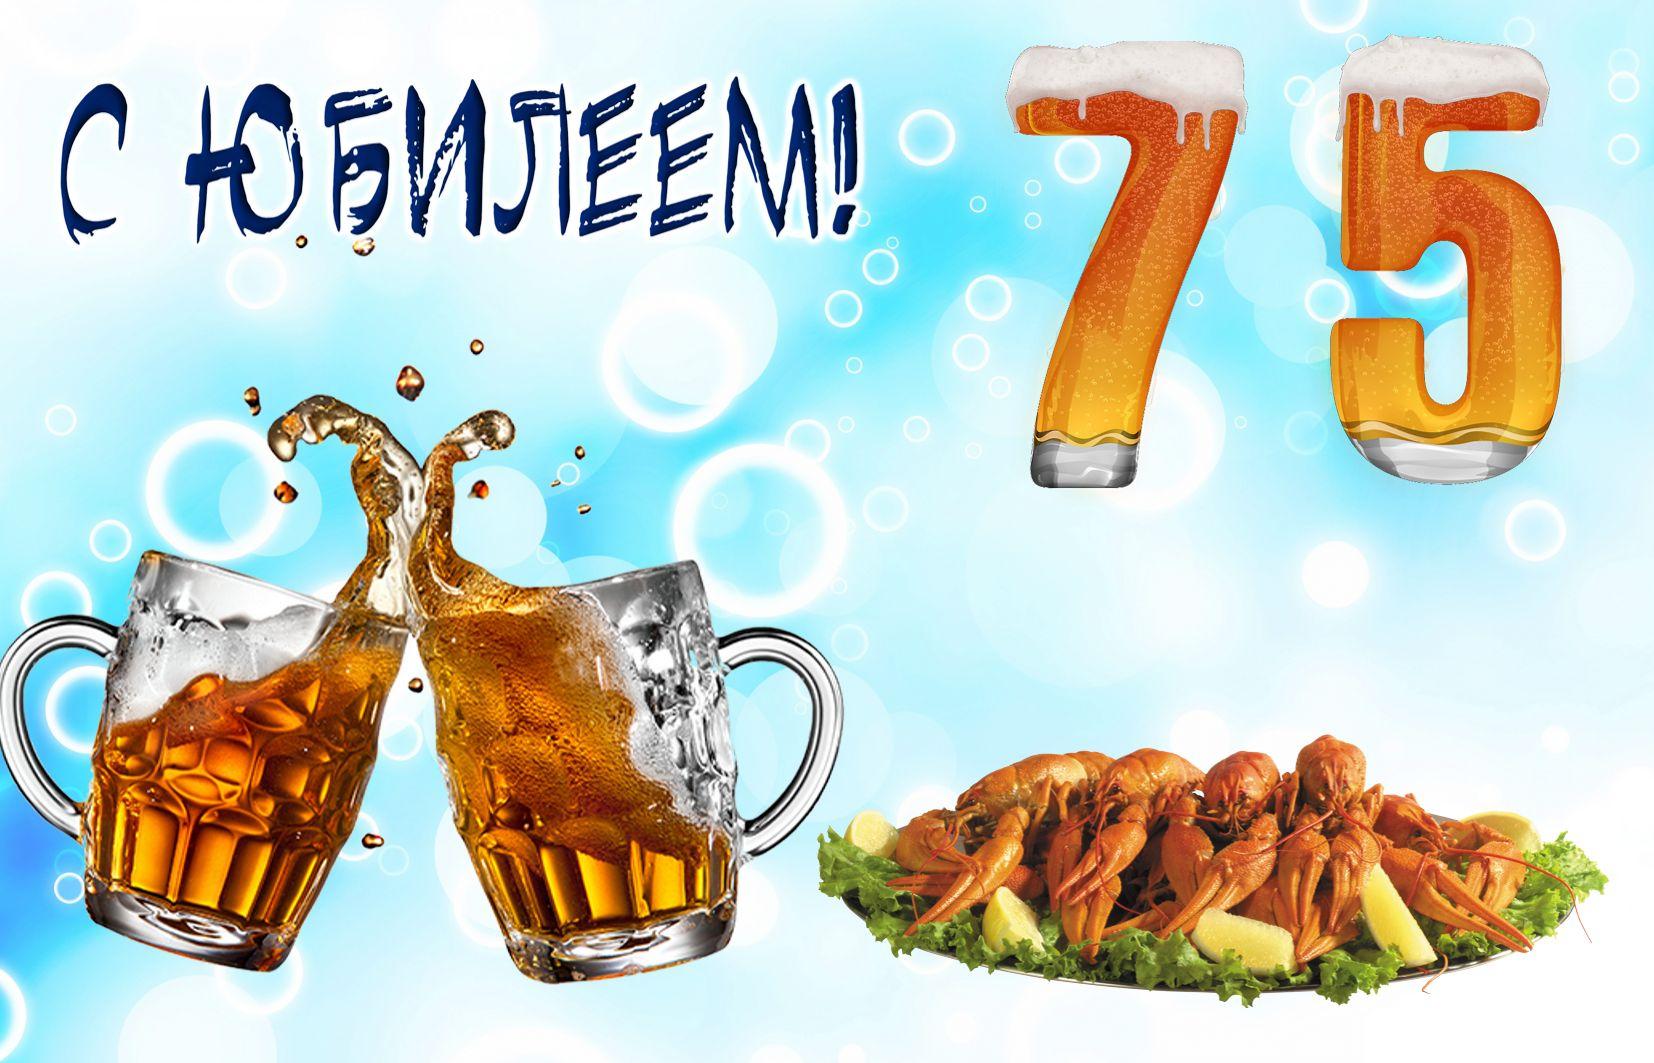 Кружки с пивом на красивом фоне к юбилею 75 лет